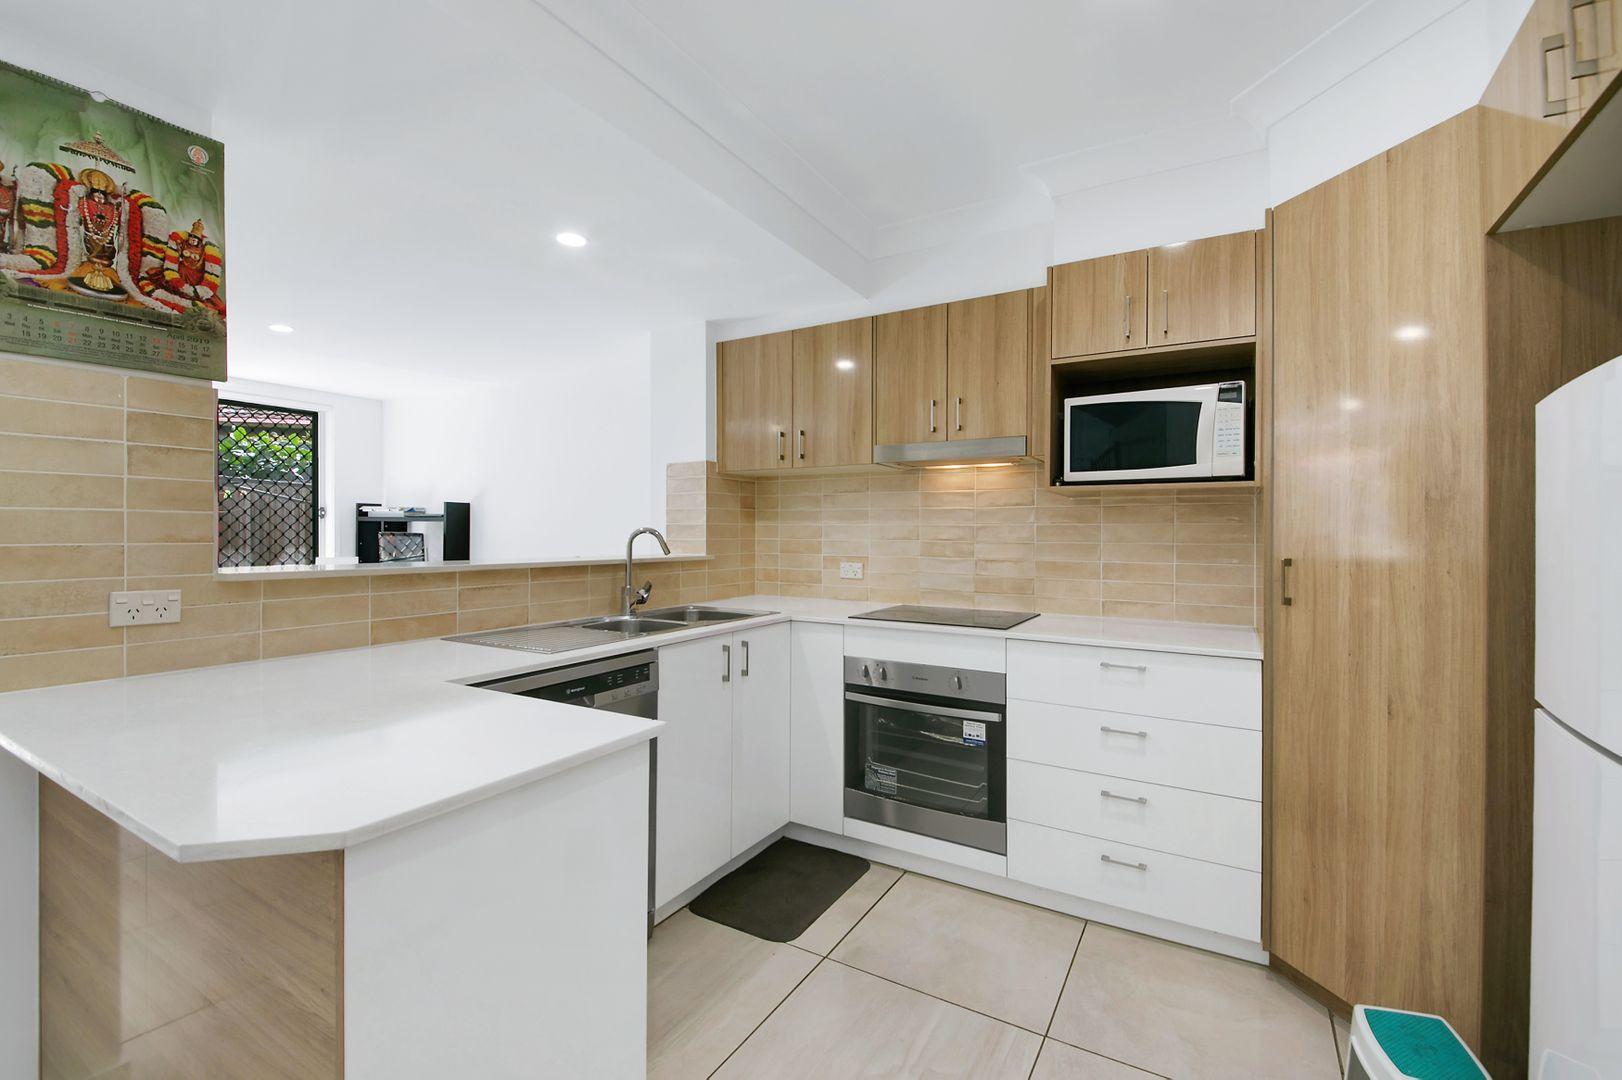 55/80 Coora Street, Wishart QLD 4122, Image 1